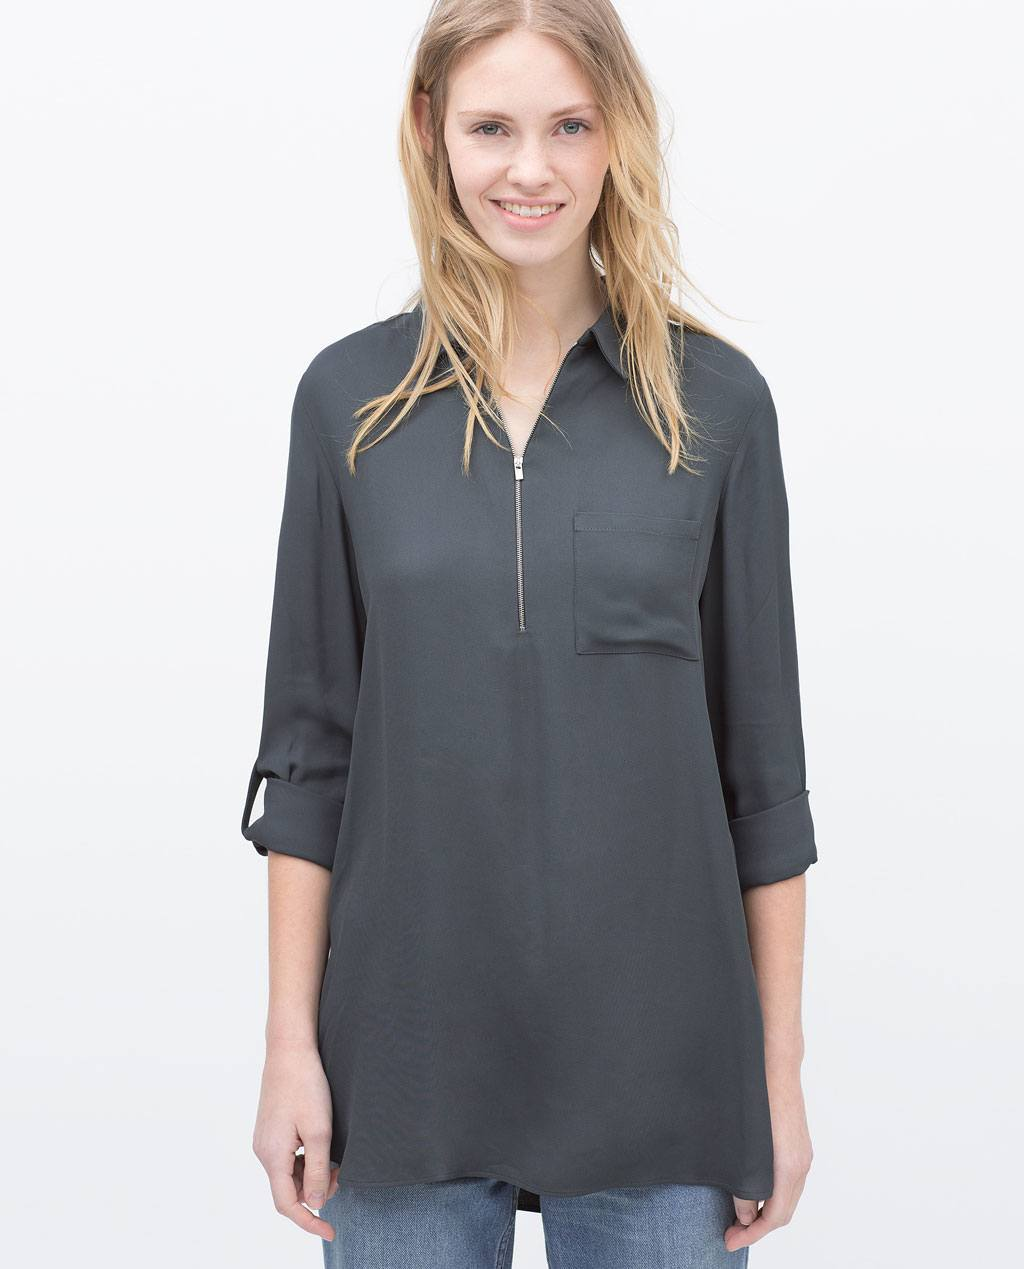 Catalogo zara premama primavera verano 2015 camisa - Catalogo de zara primavera verano 2015 ...